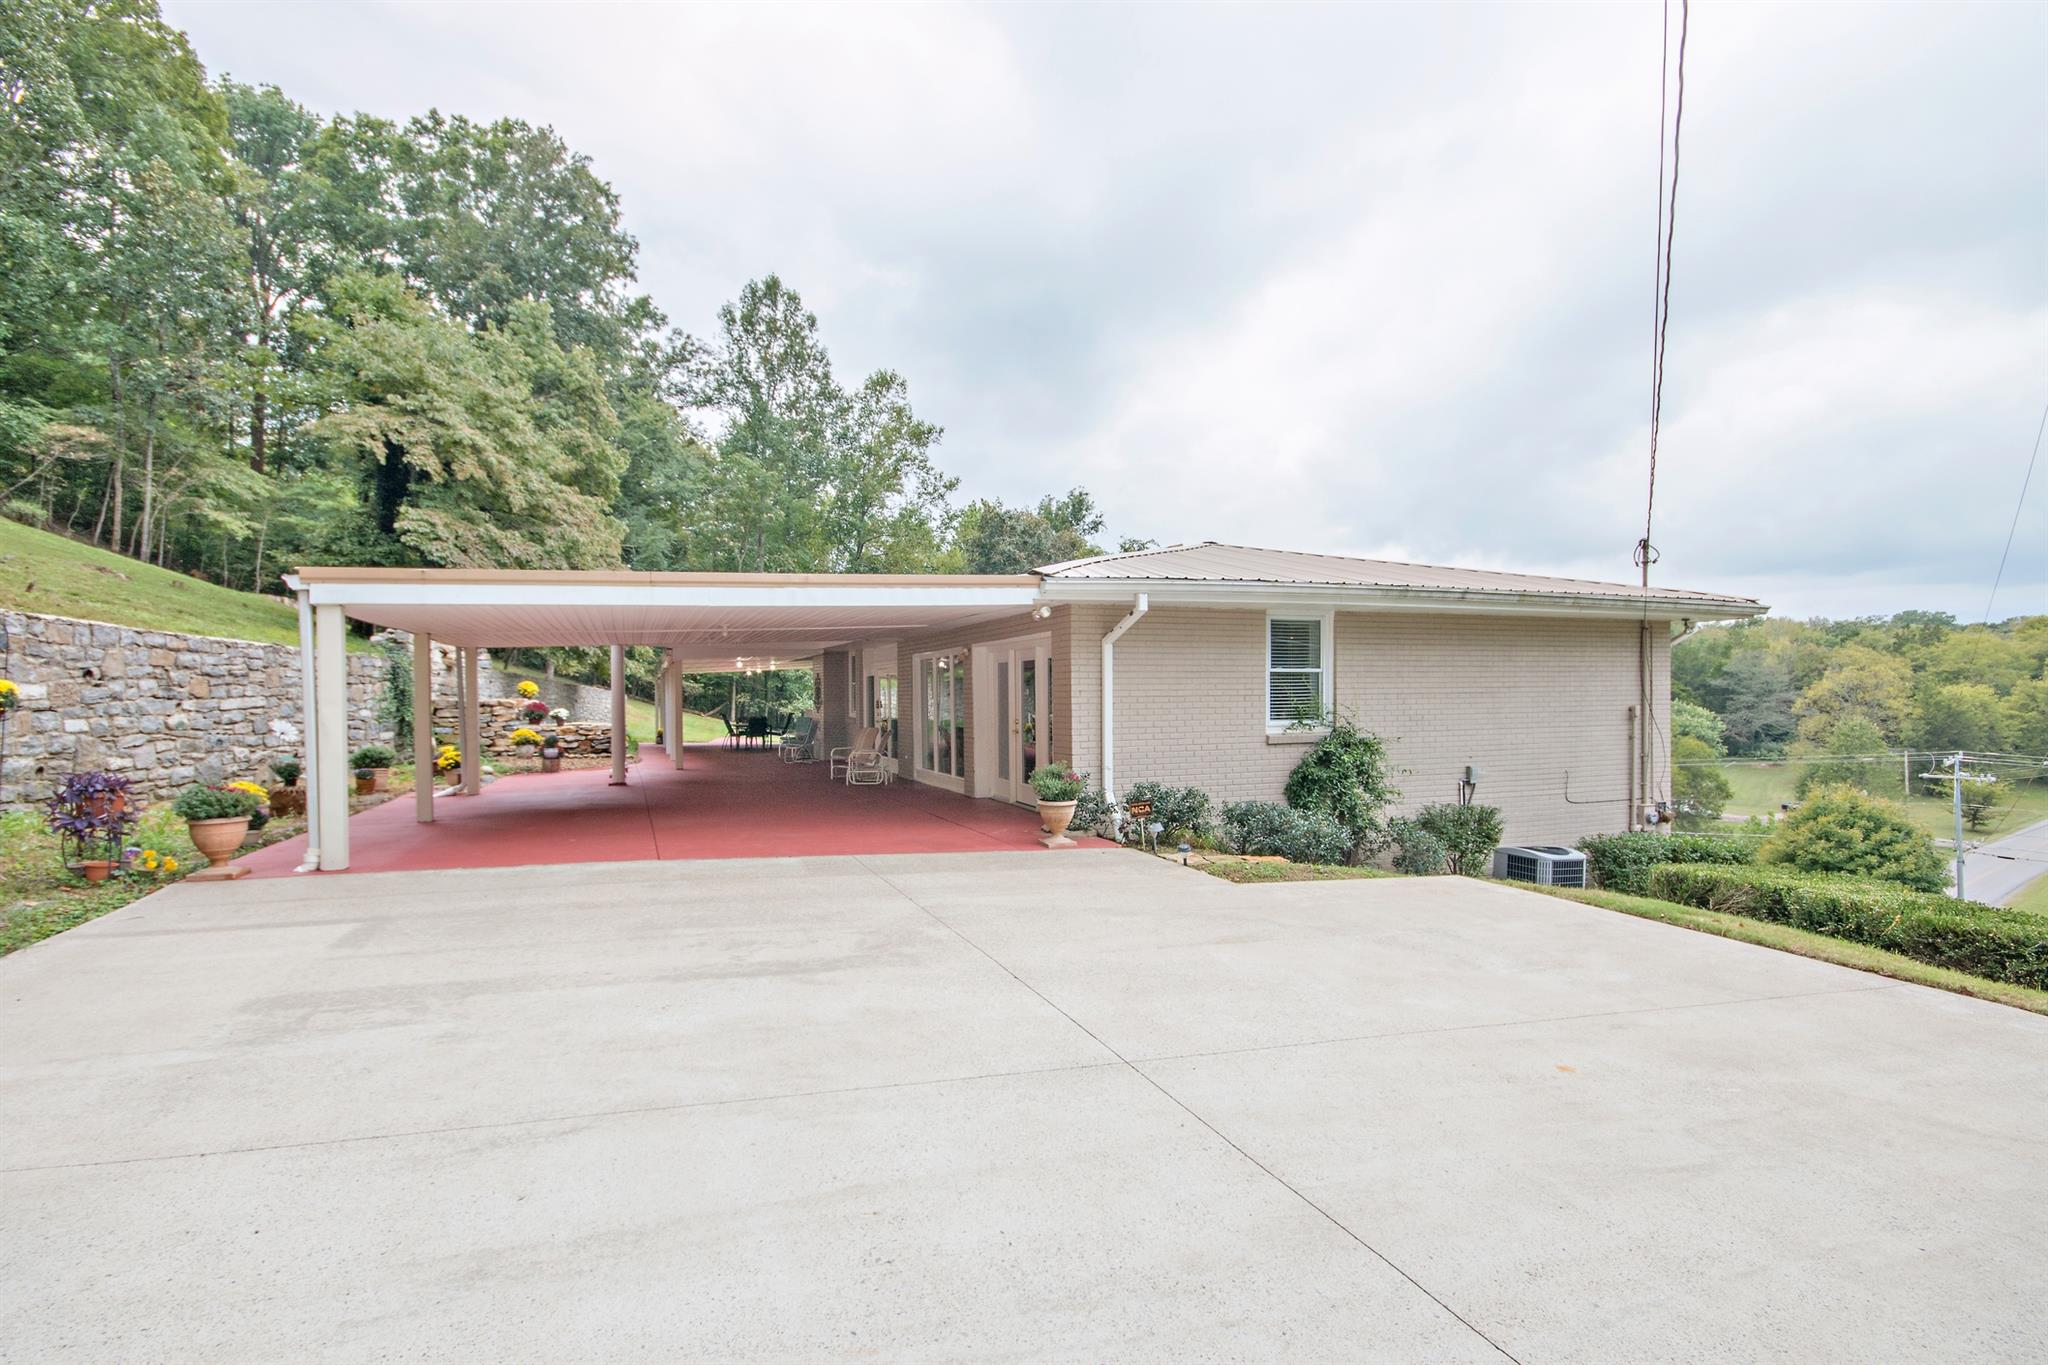 1800 Centerpoint Rd, Hendersonville, TN, 37075 Primary Photo